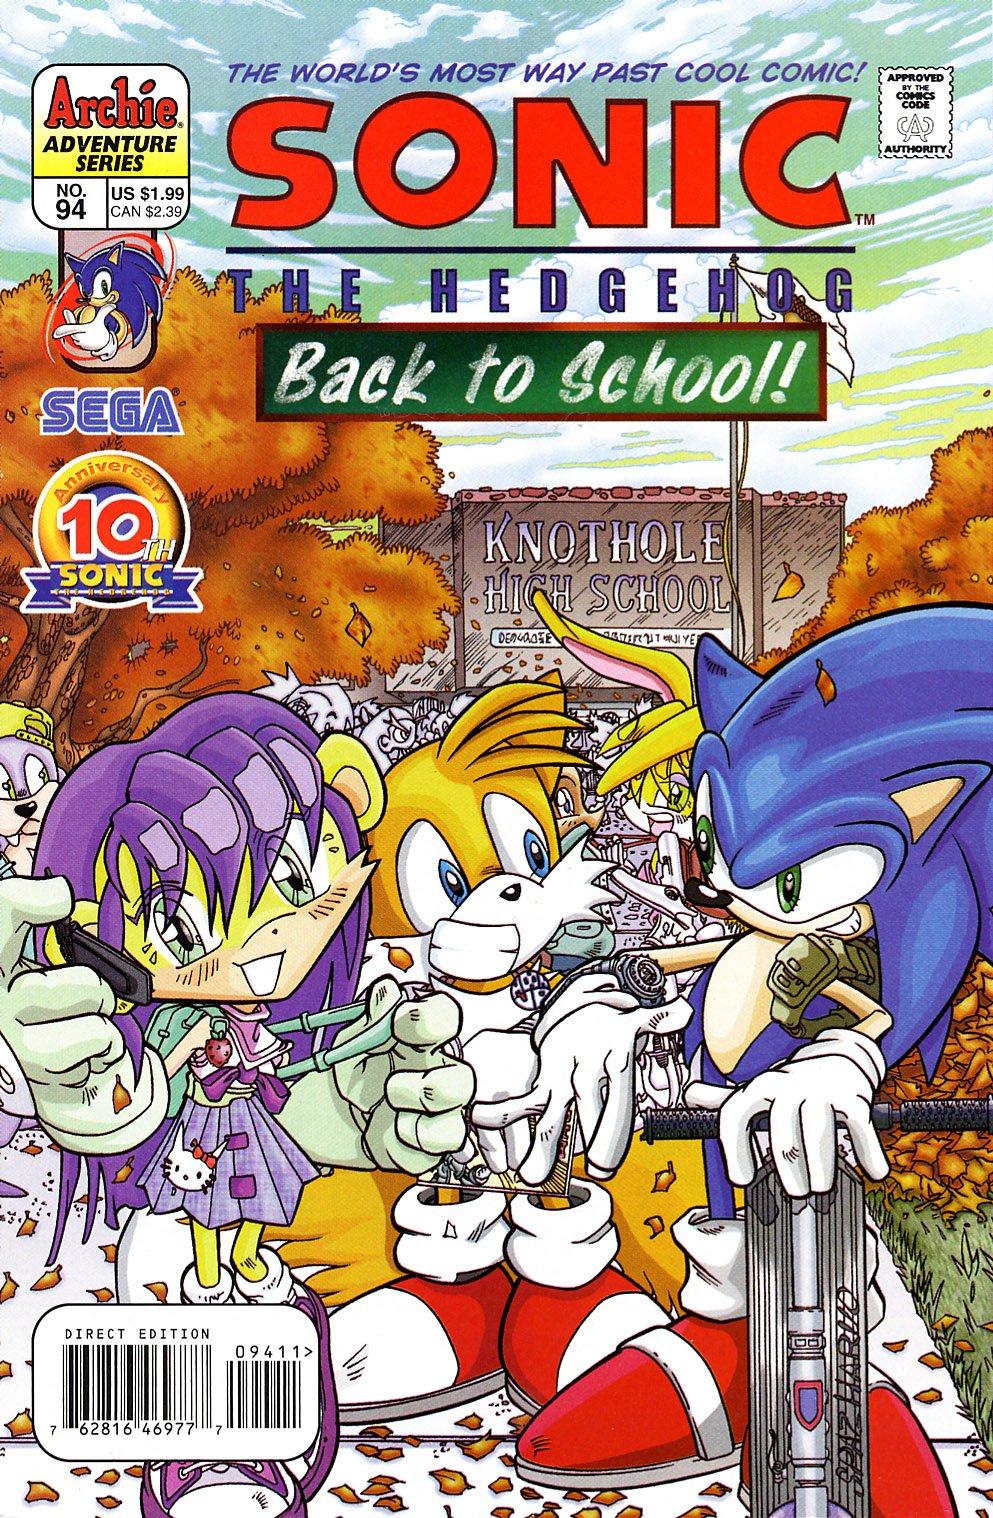 Sonic the Hedgehog 094 (April 2001)